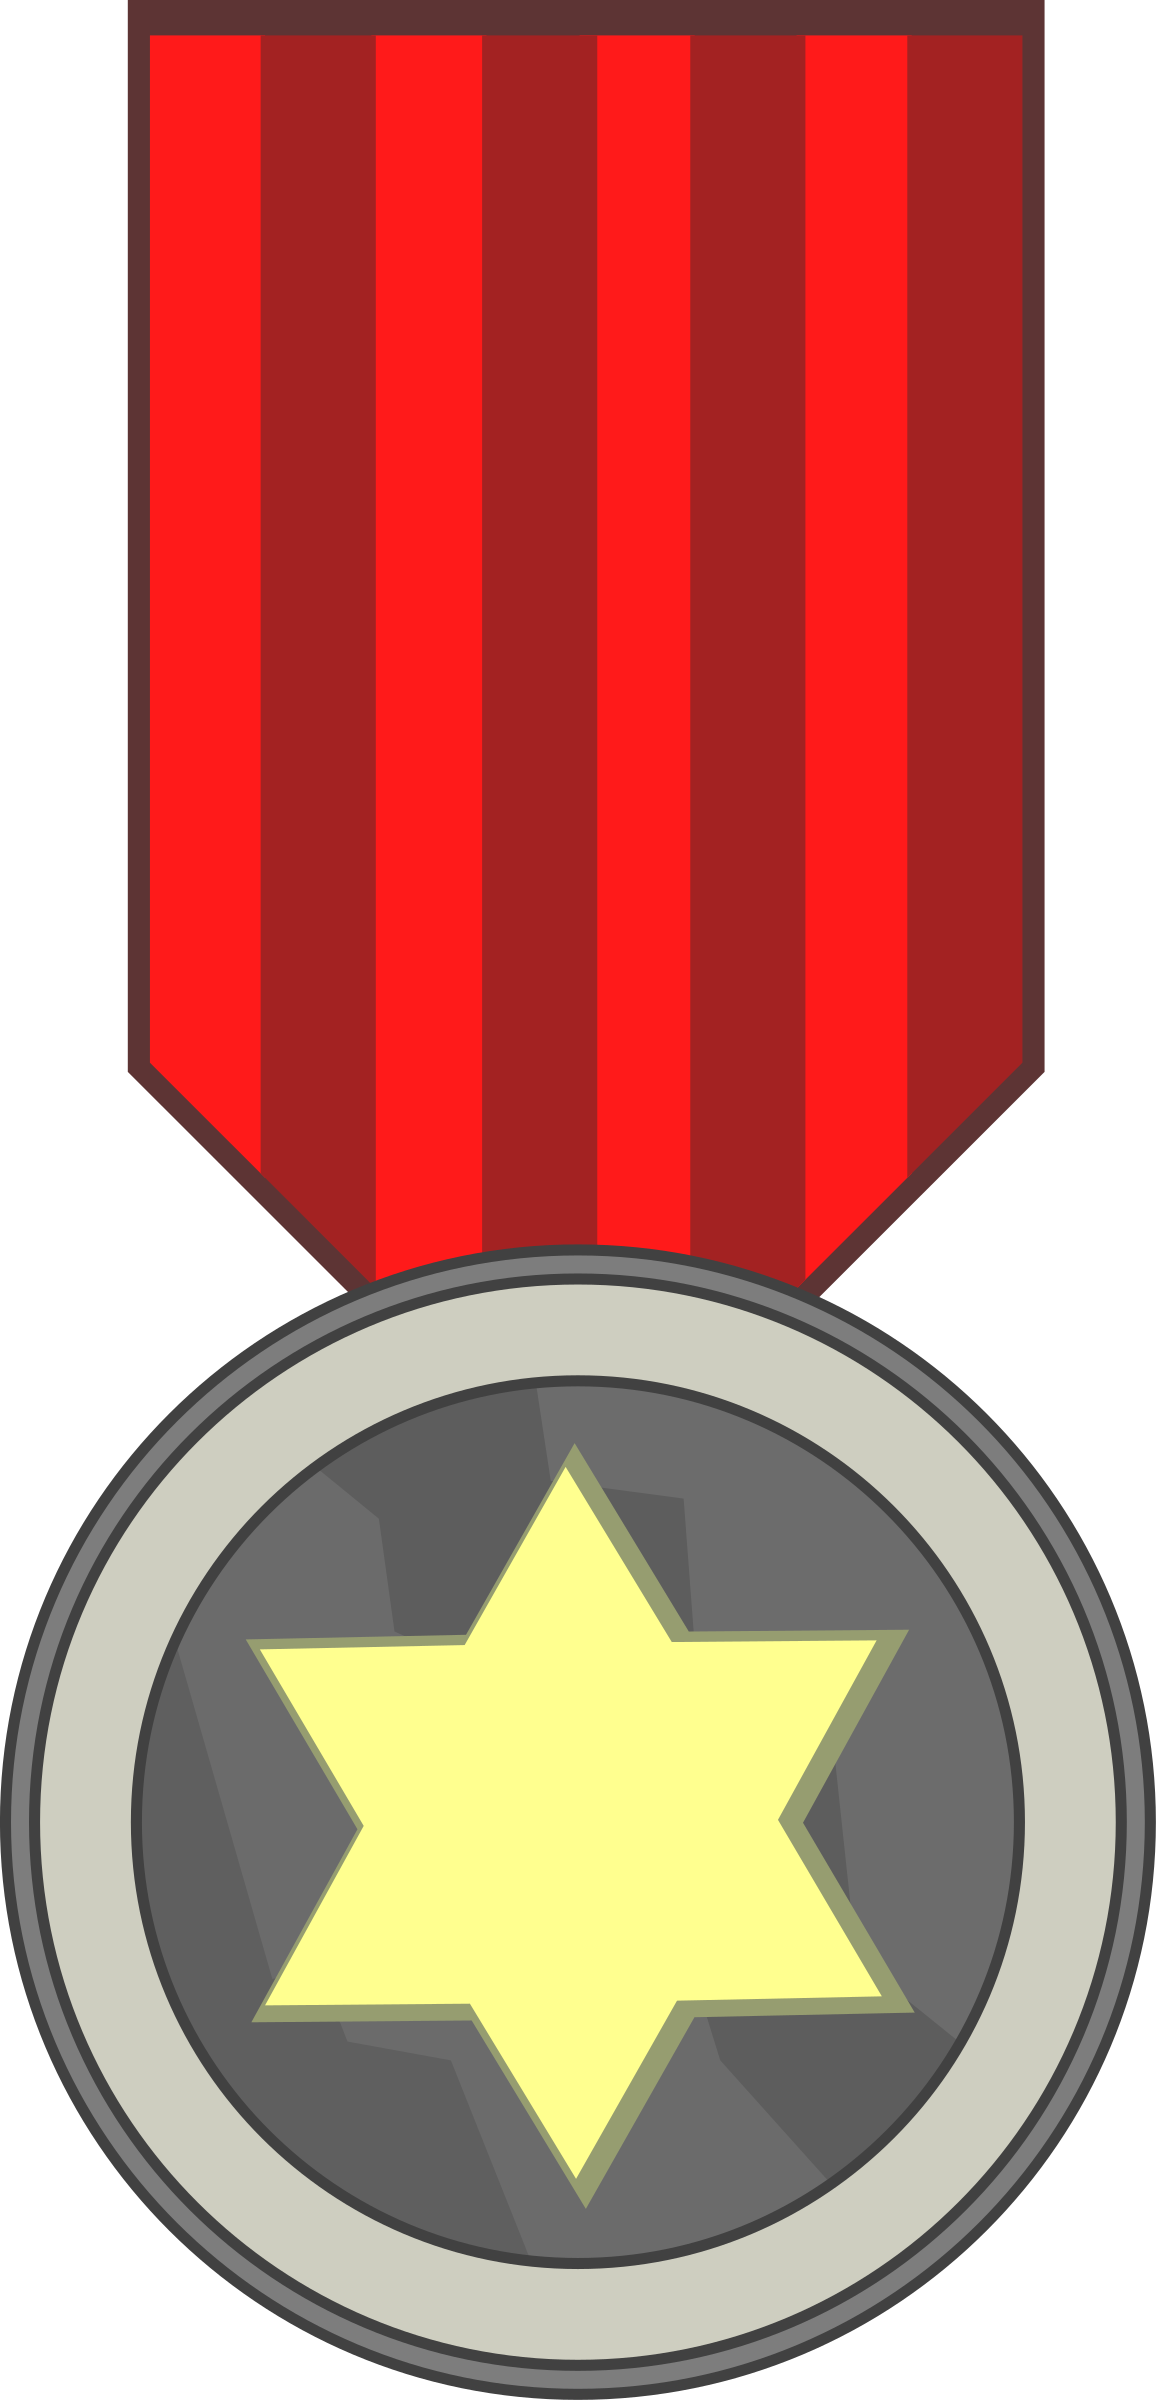 banner black and white download Awards clipart star. Award medal big image.